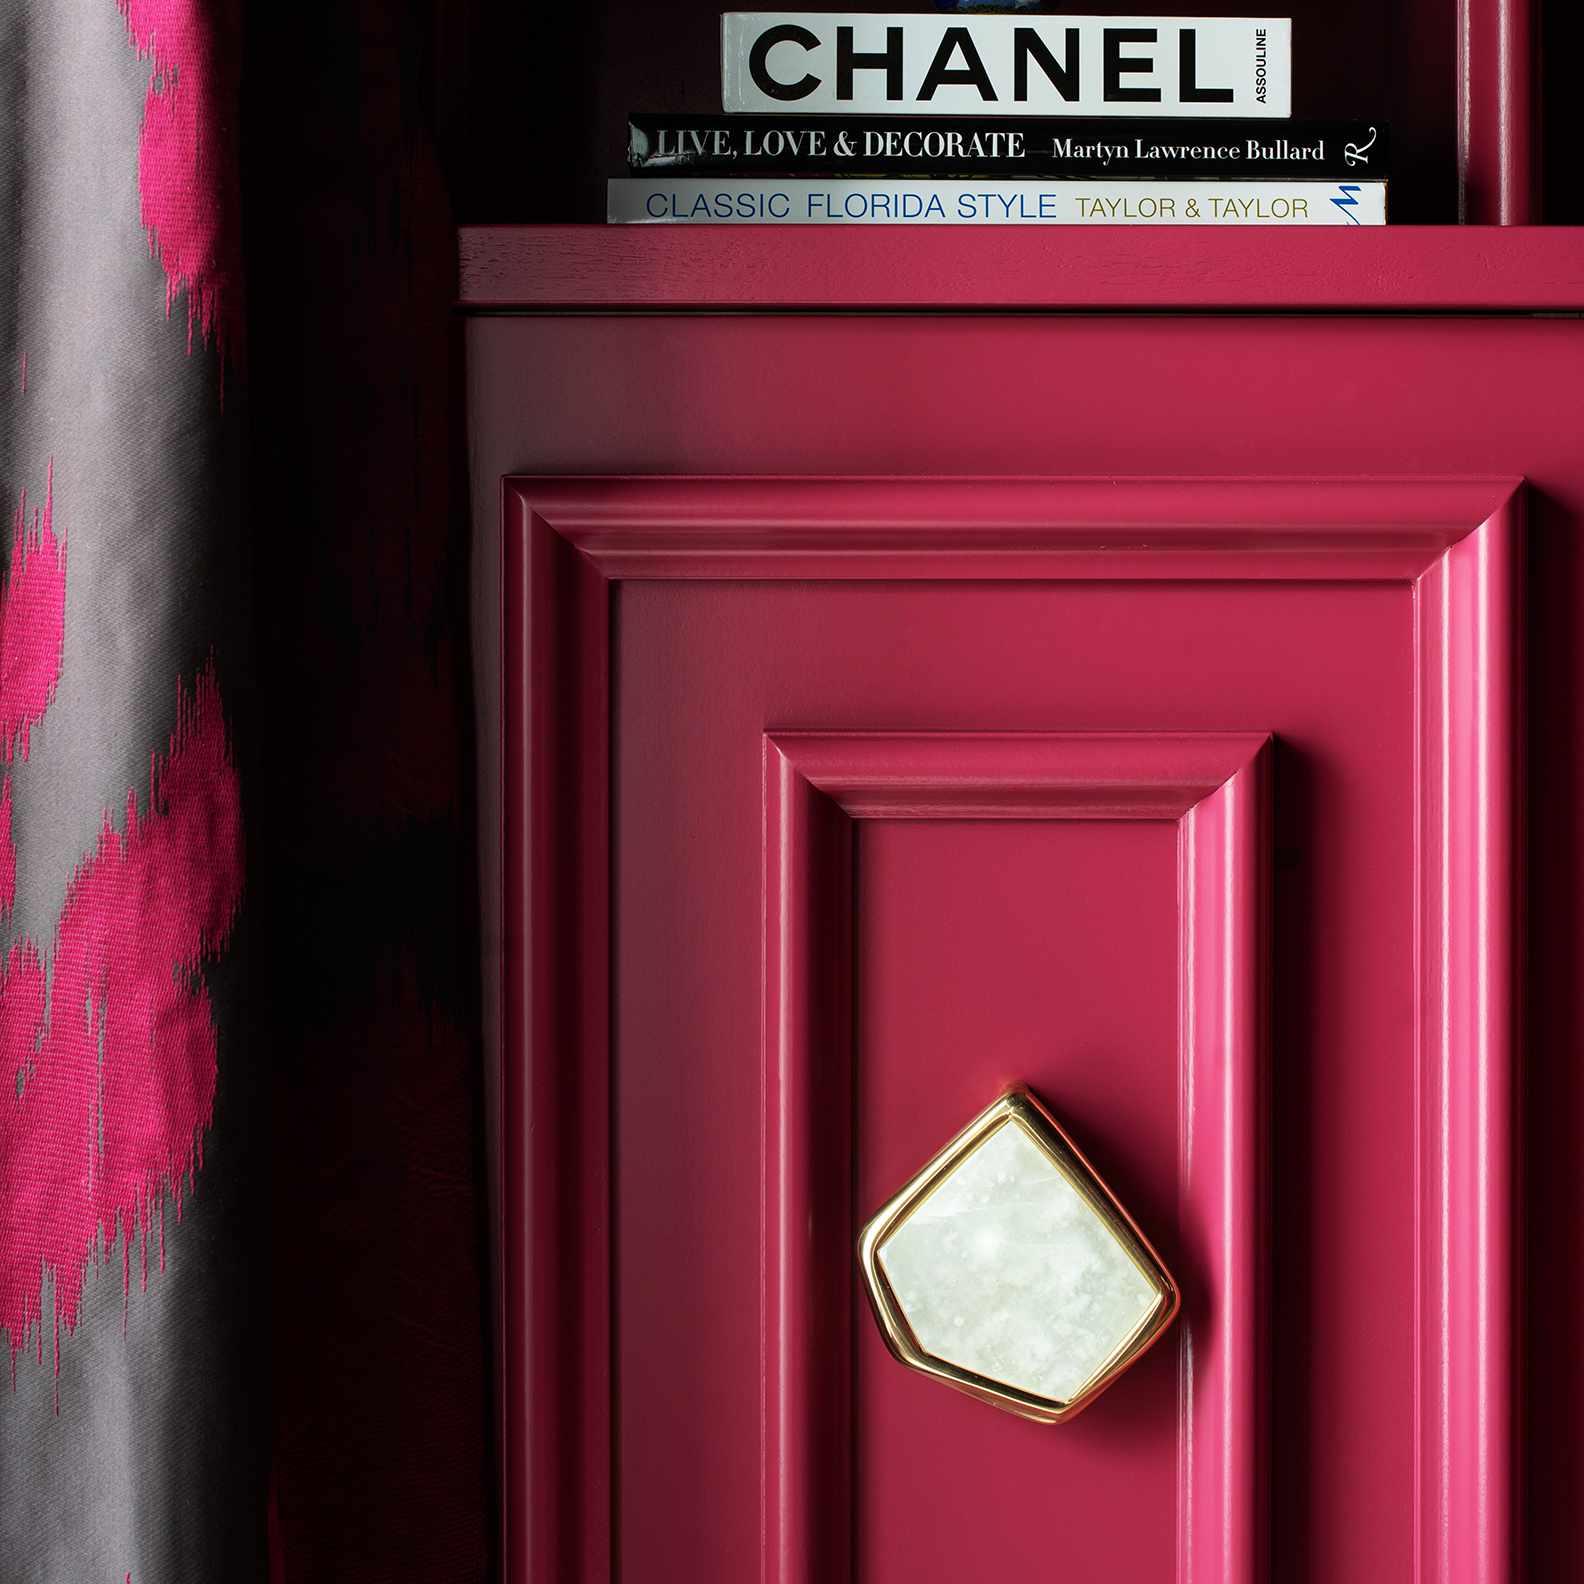 Lisa Gilmore's favorite room - raspberry den detail shot with books and vase